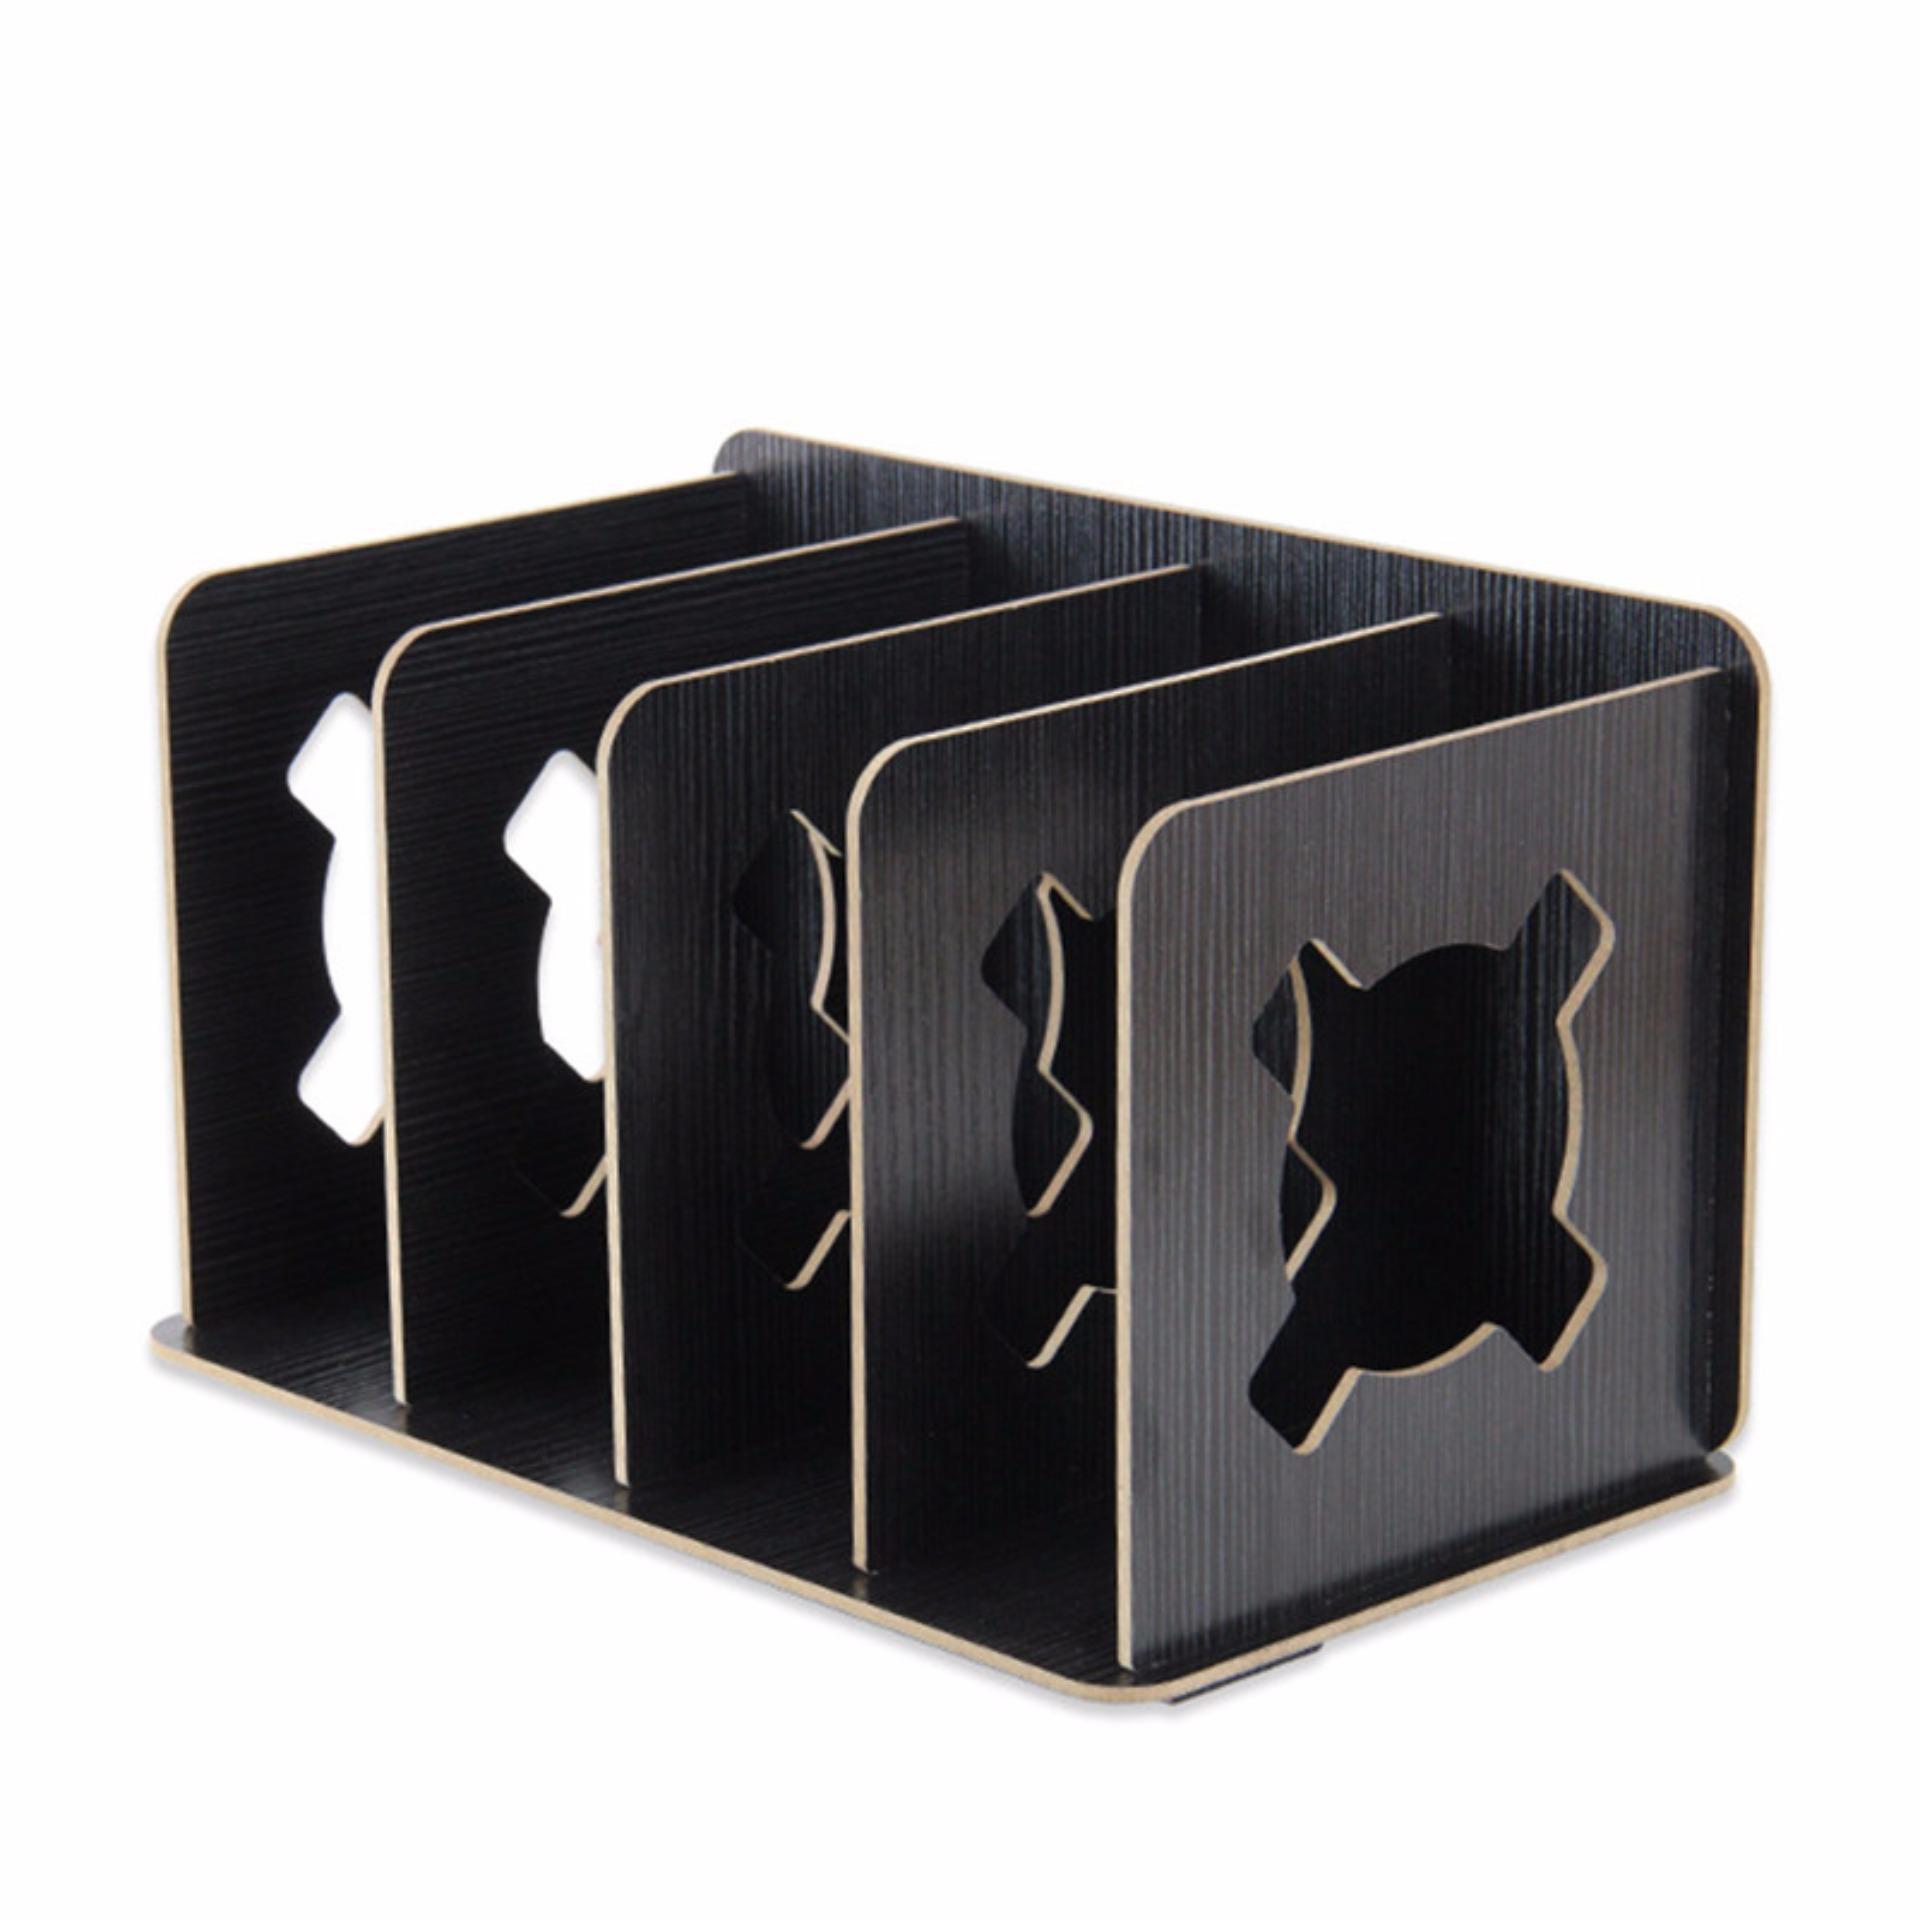 Detachable Wooden Grain Design Home Desk Book Rack Desktop DIYOrganizer  Shelf Office Supplies Magazine File Storage